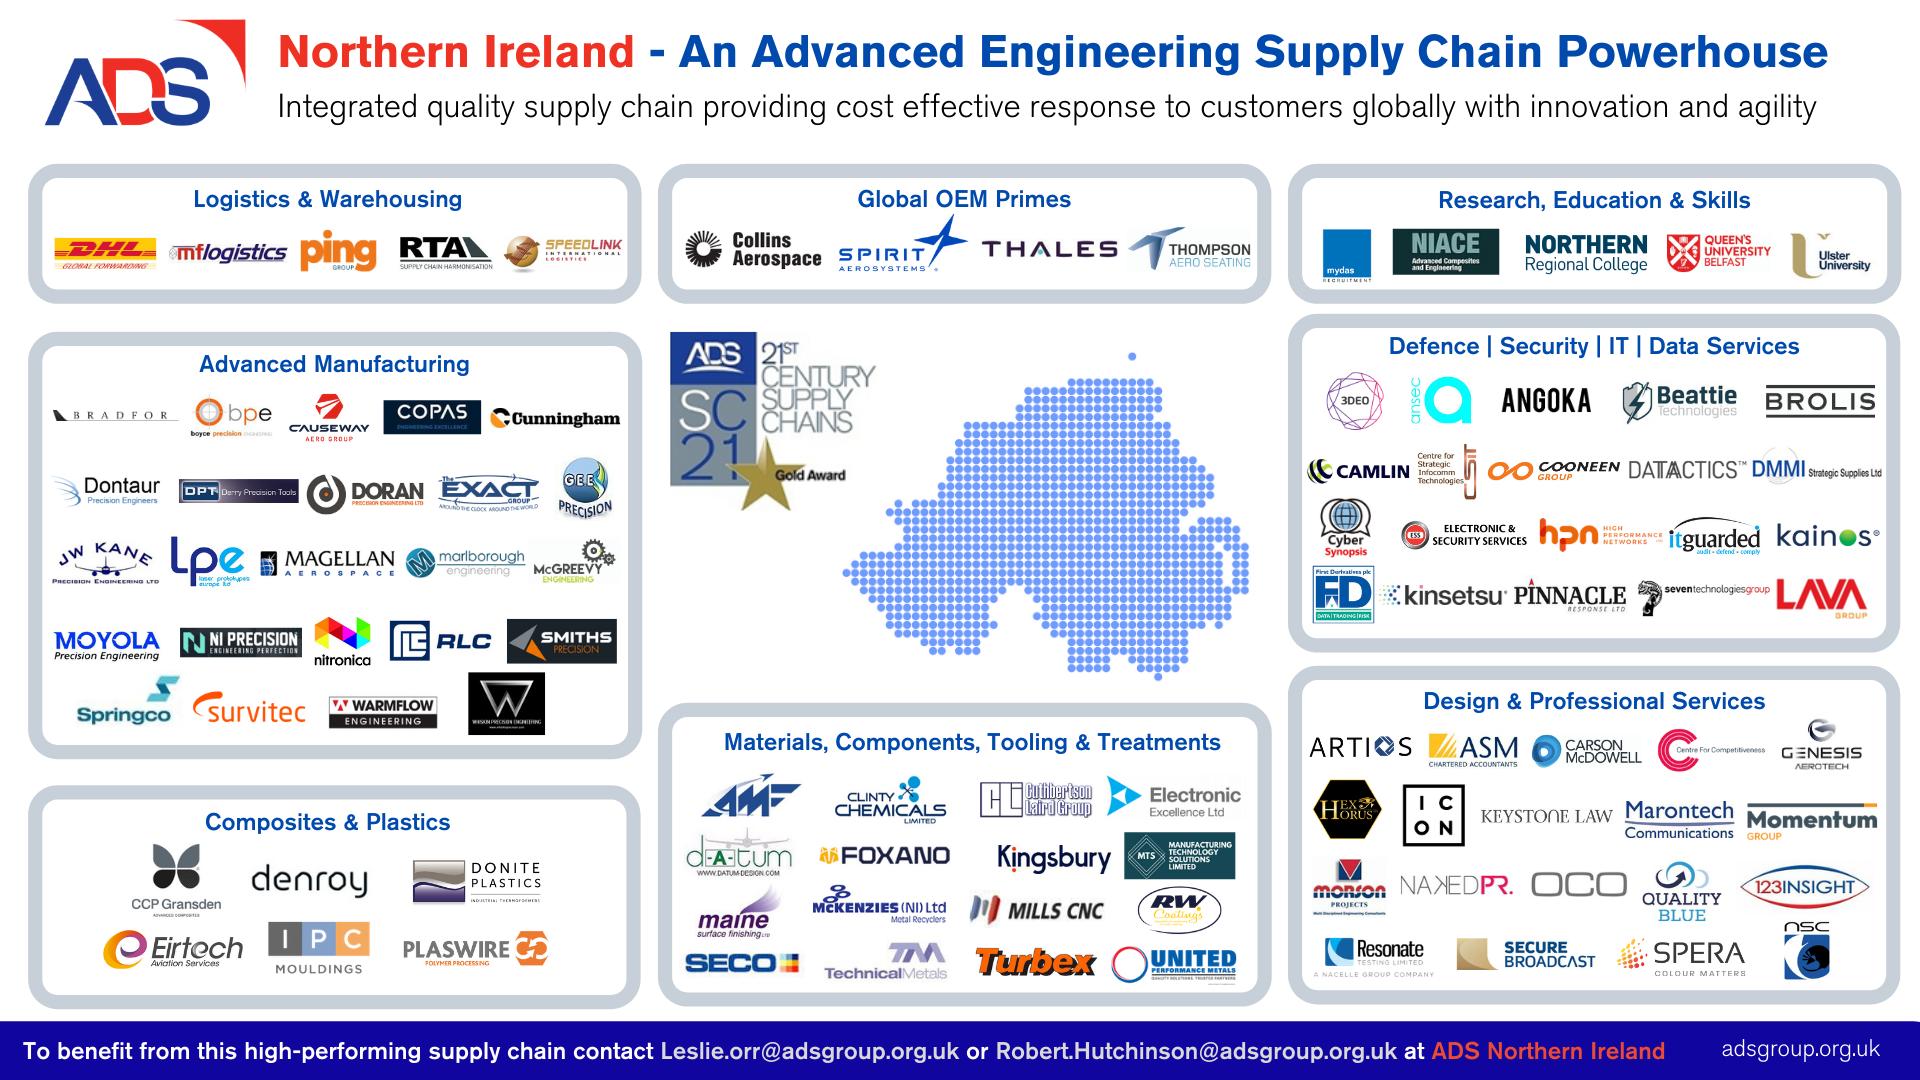 ADS NI - Supply Chain Powerhouse - Feb 2021